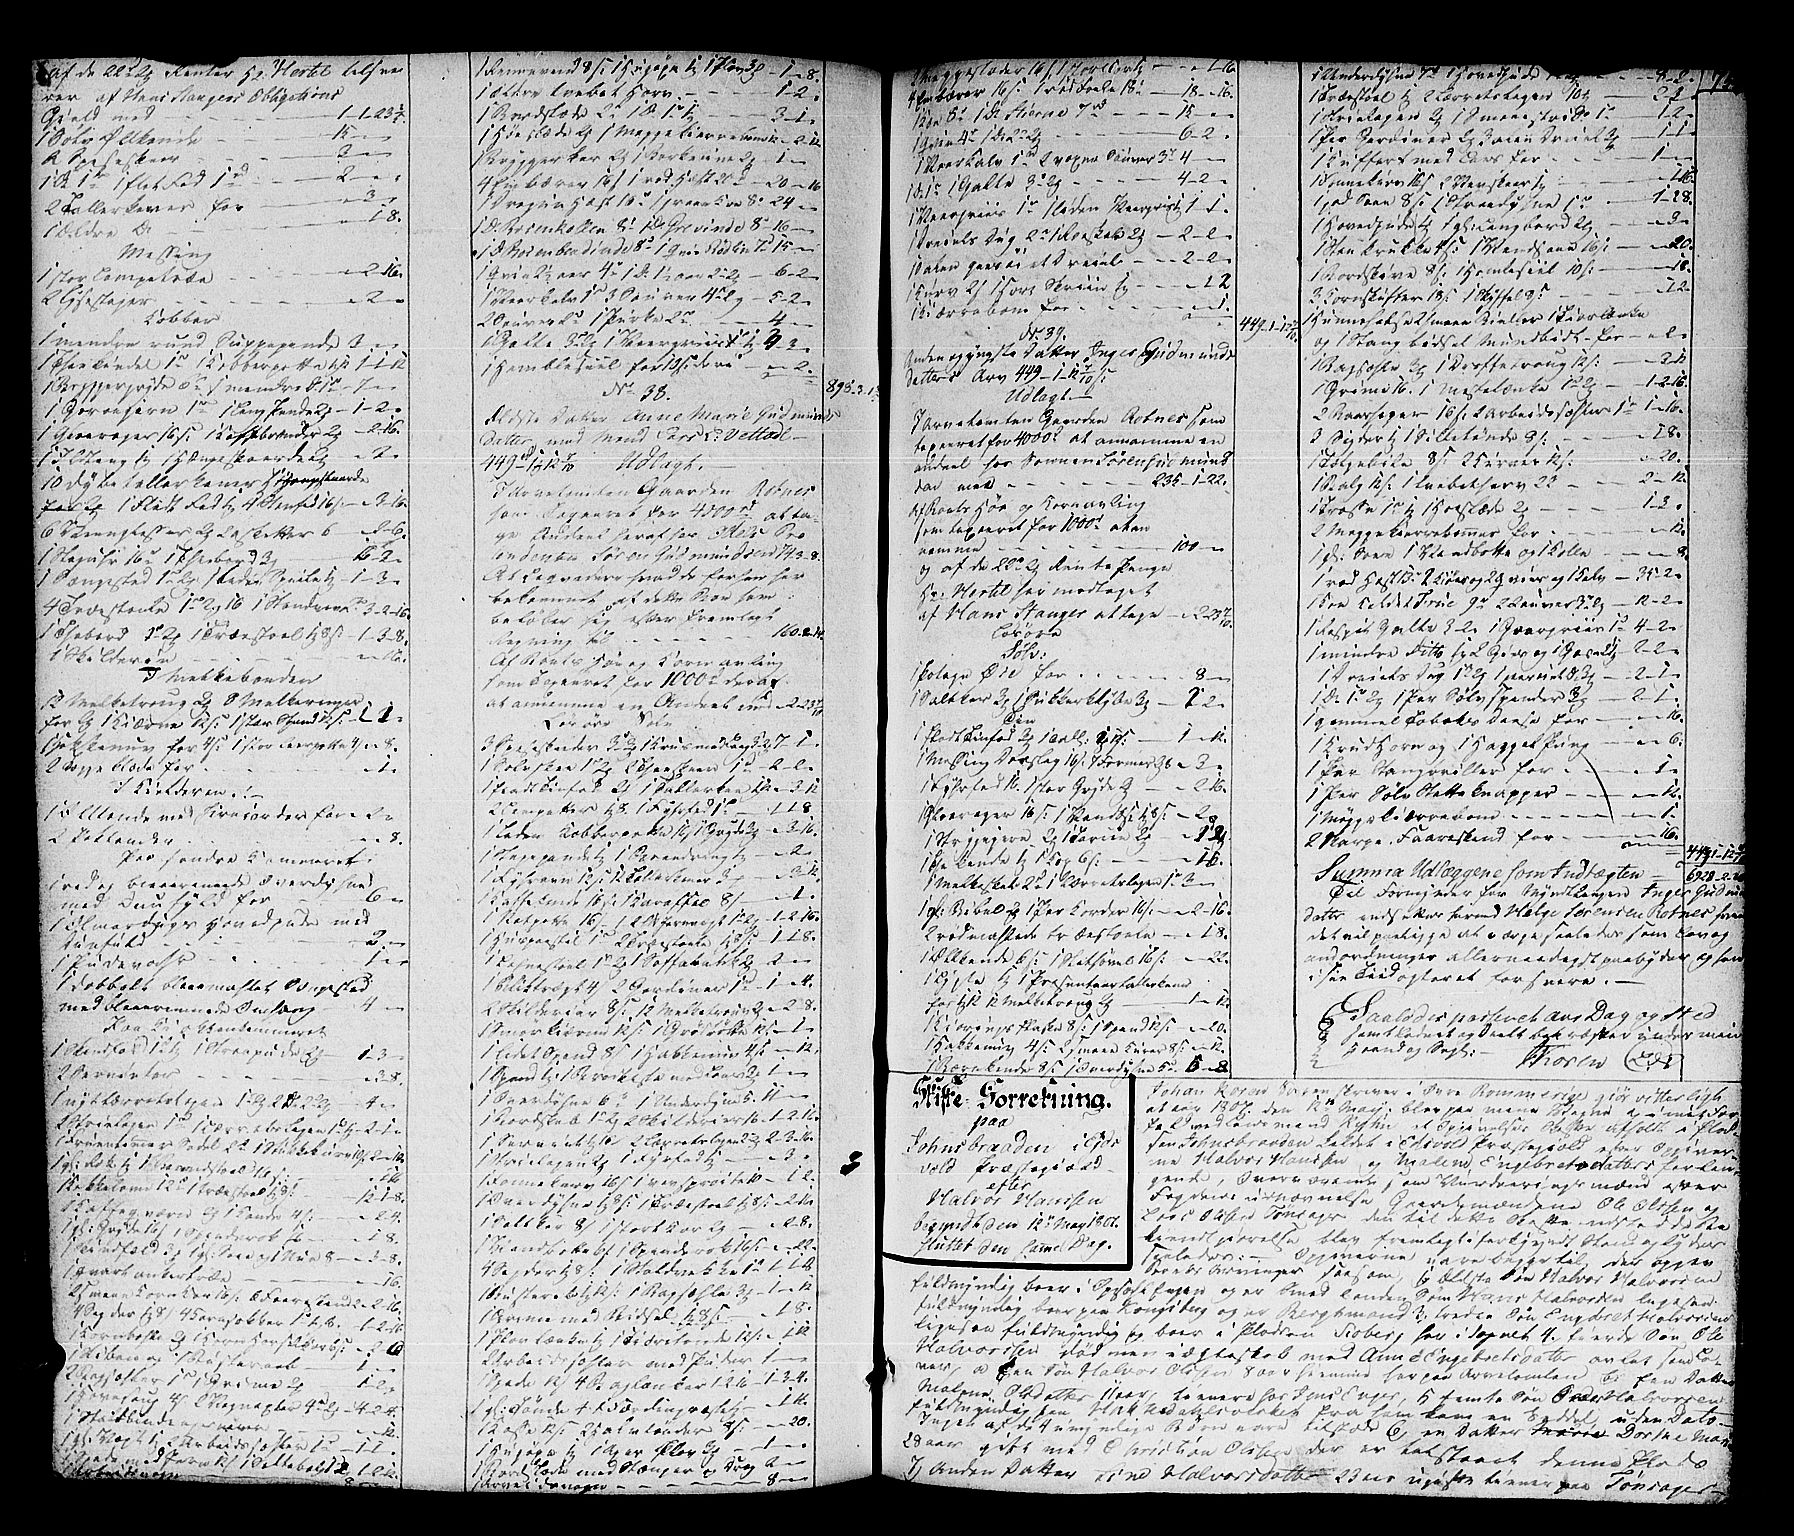 SAO, Øvre Romerike sorenskriveri, H/Hb/L0014: Skifteprotokoll nr. 14, 1798-1808, s. 753b-754a